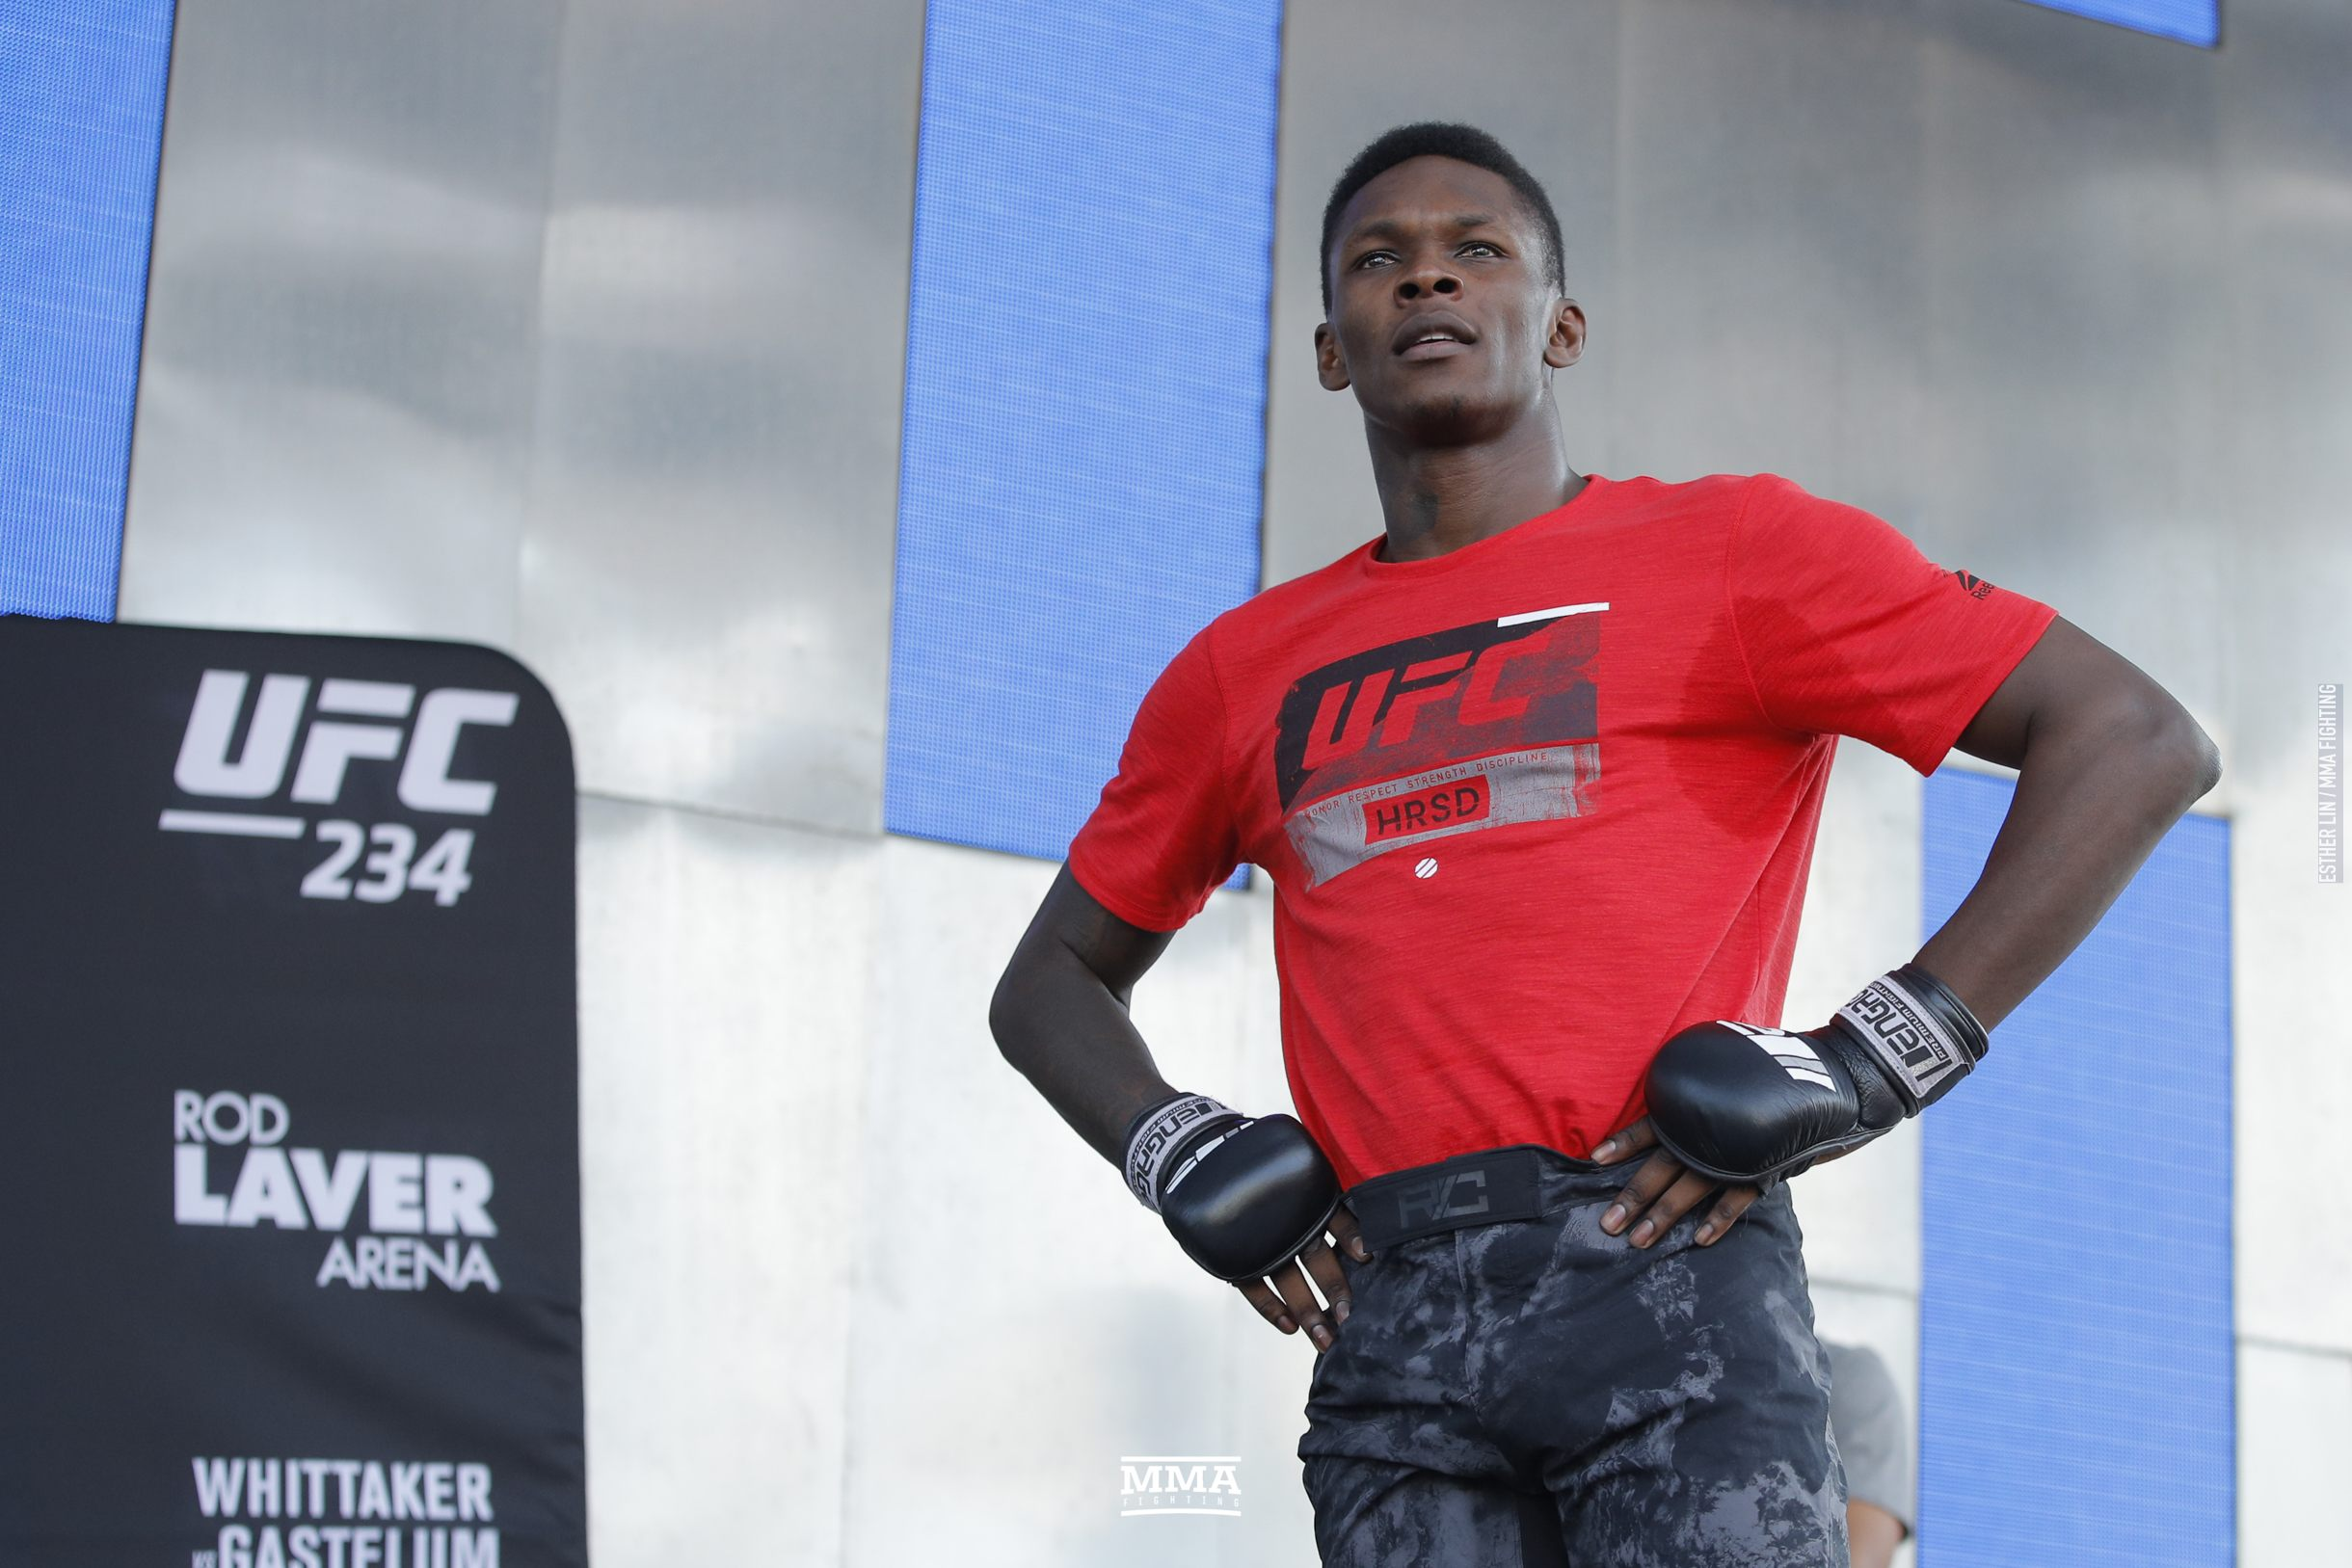 UFC 234 open workout photos